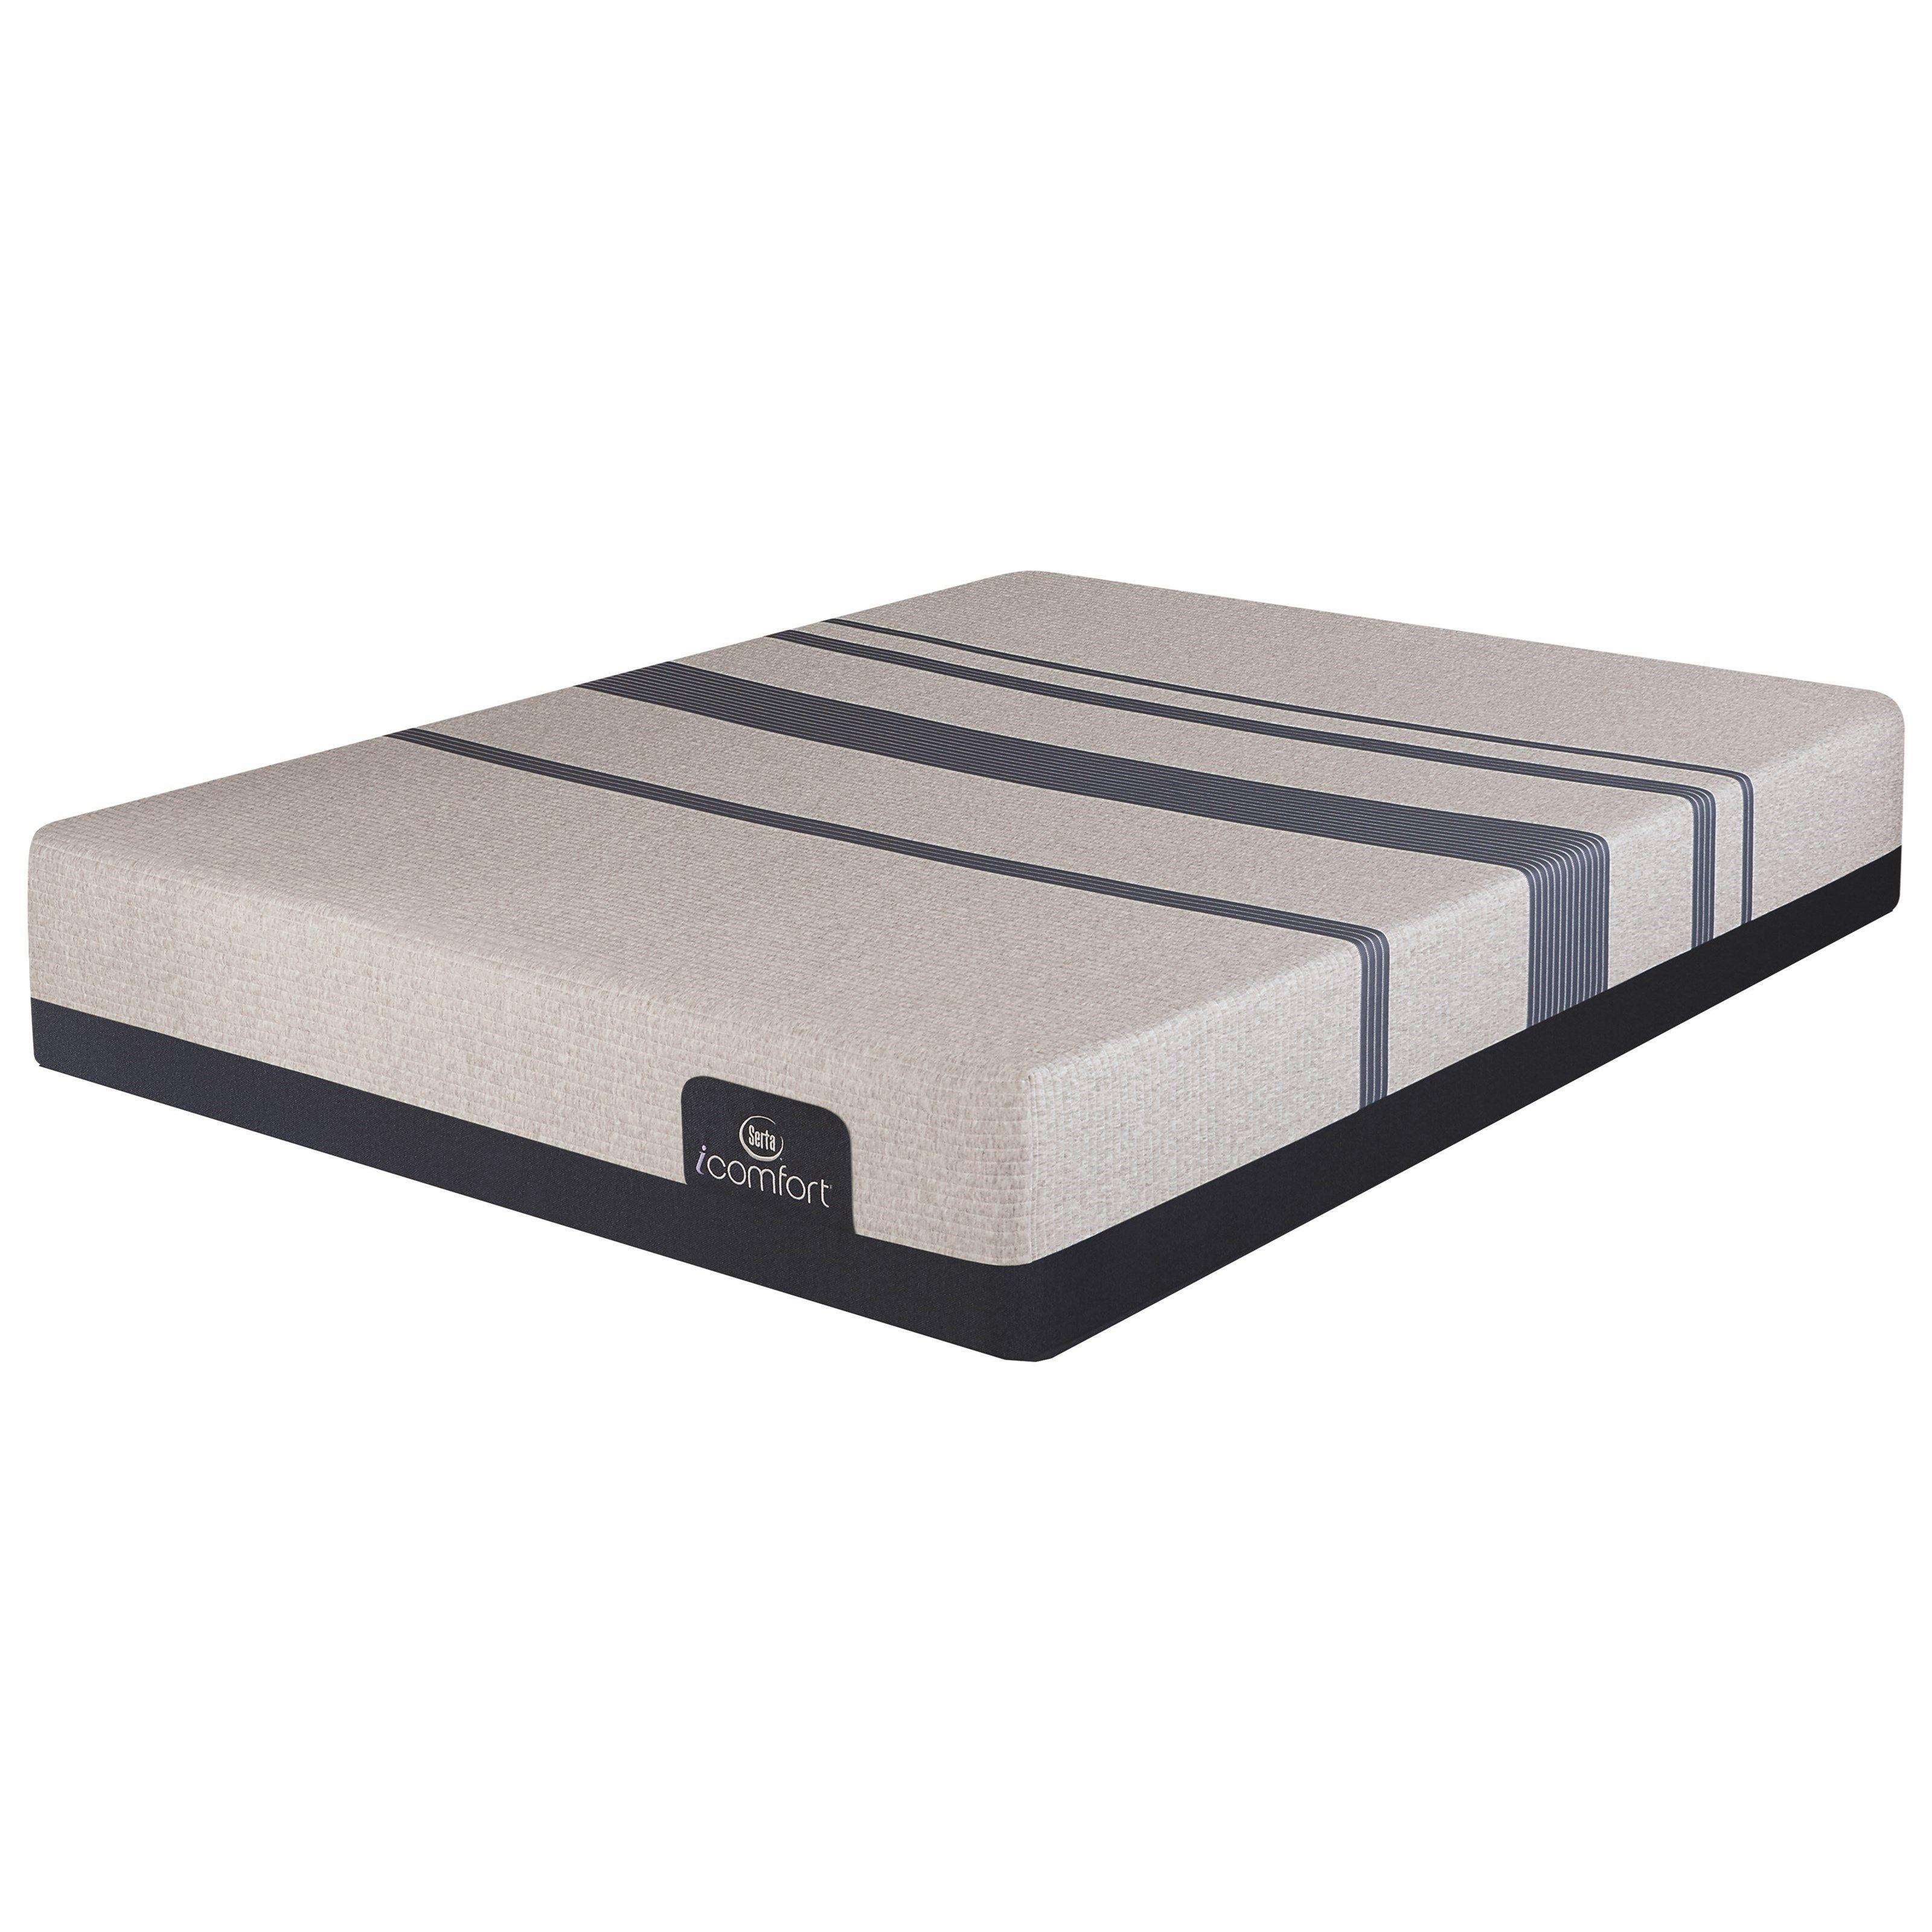 Icomfort Blue 300 Firm Queen Gentle Firm Gel Memory Foam Mattress By Serta At Crowley Furniture Yatak